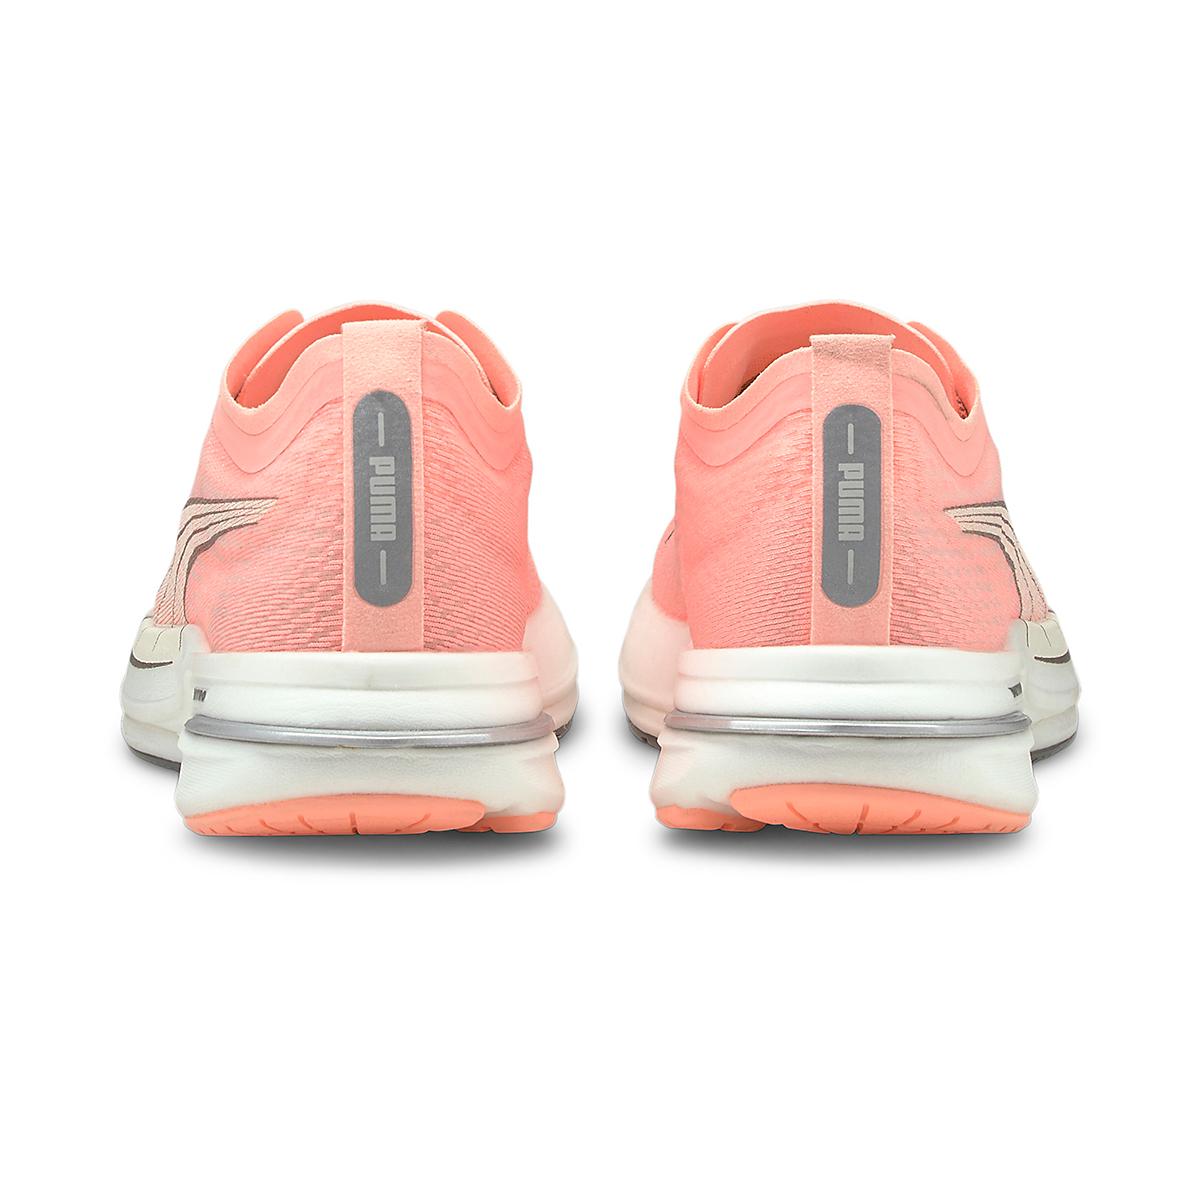 Women's Puma Deviate Nitro Running Shoe - Color: Elektro Peach - Size: 5.5 - Width: Regular, Elektro Peach, large, image 4